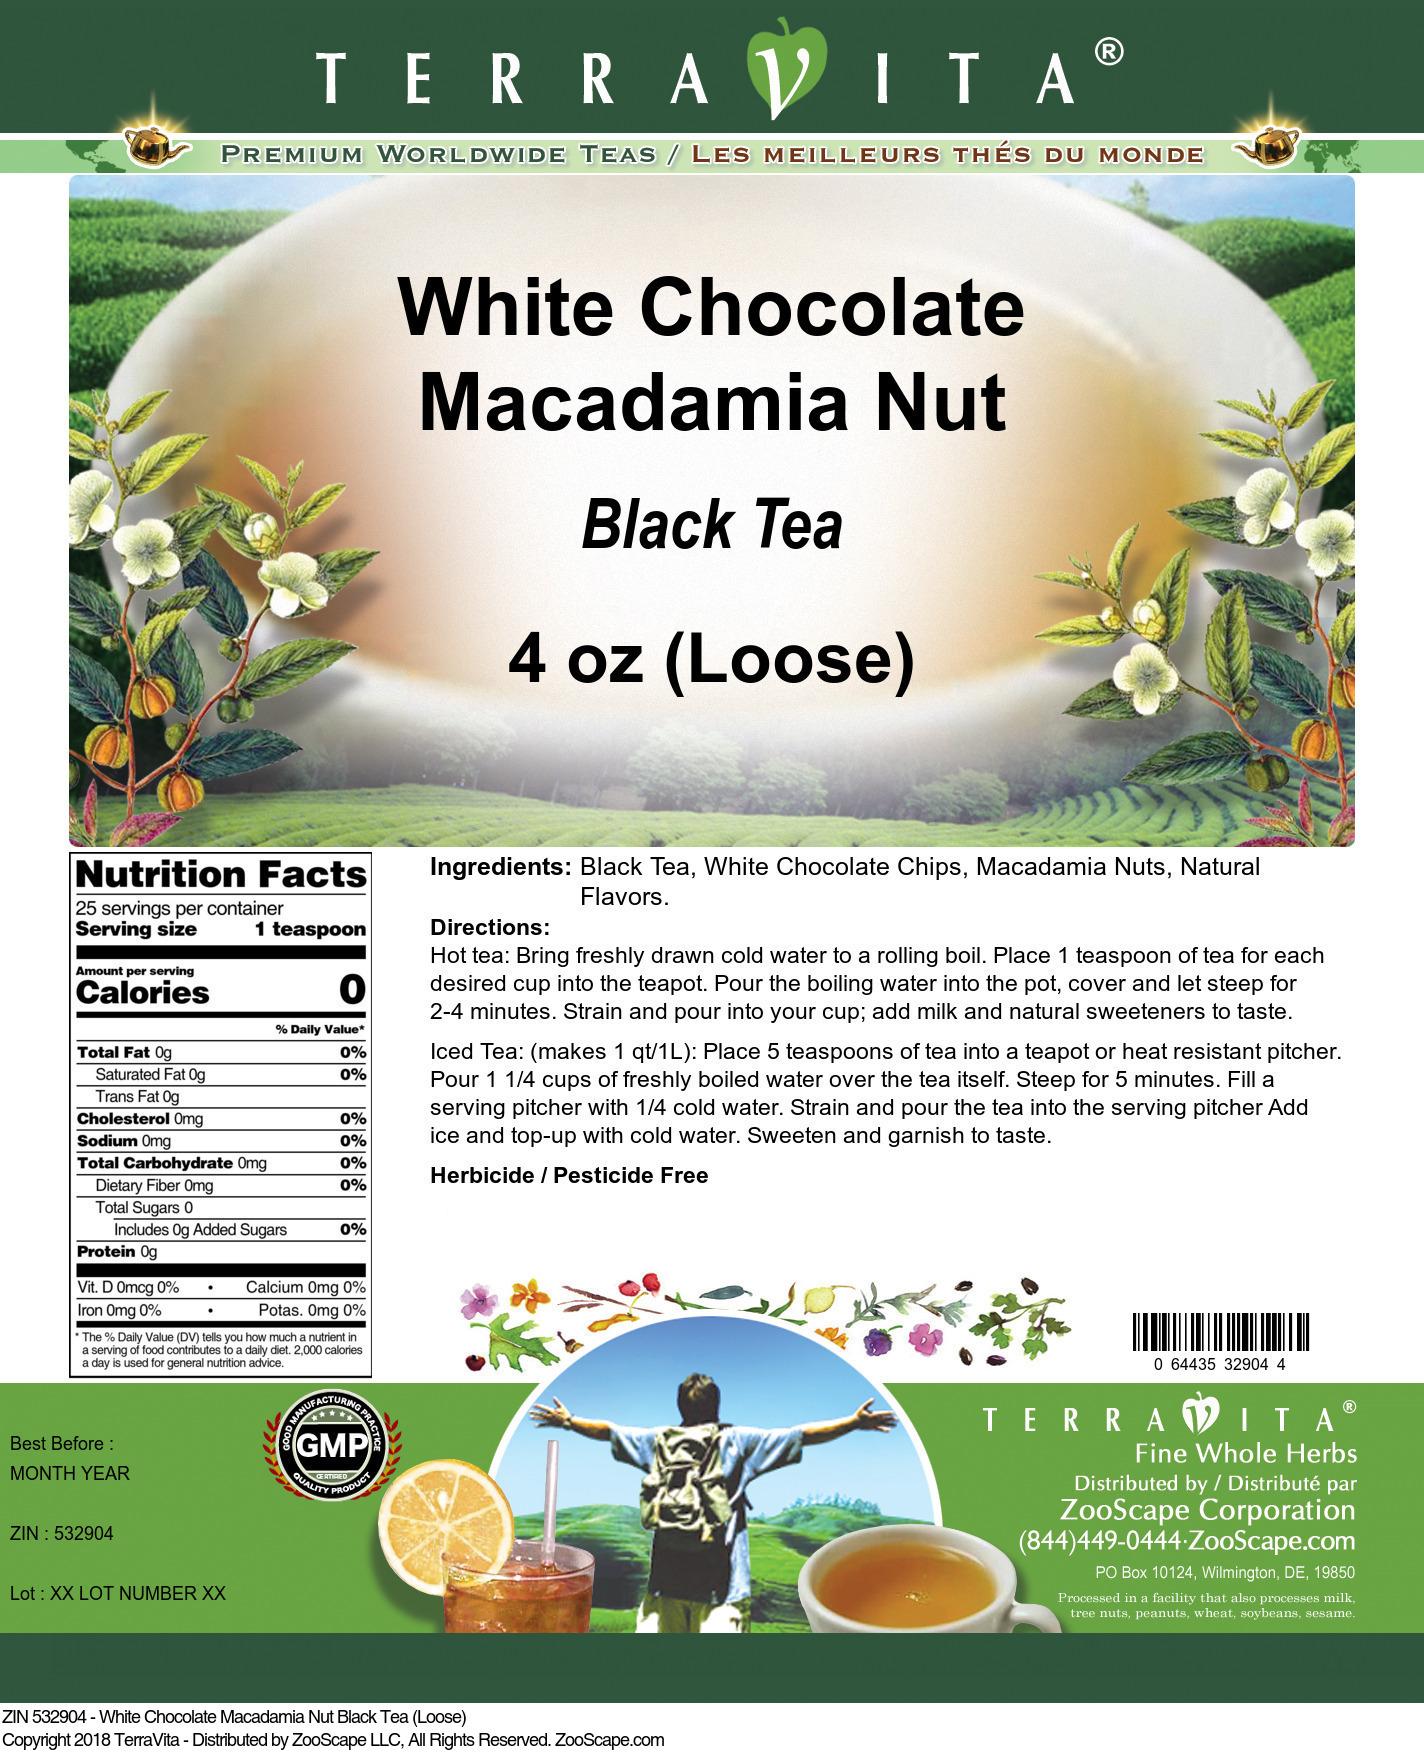 White Chocolate Macadamia Nut Black Tea